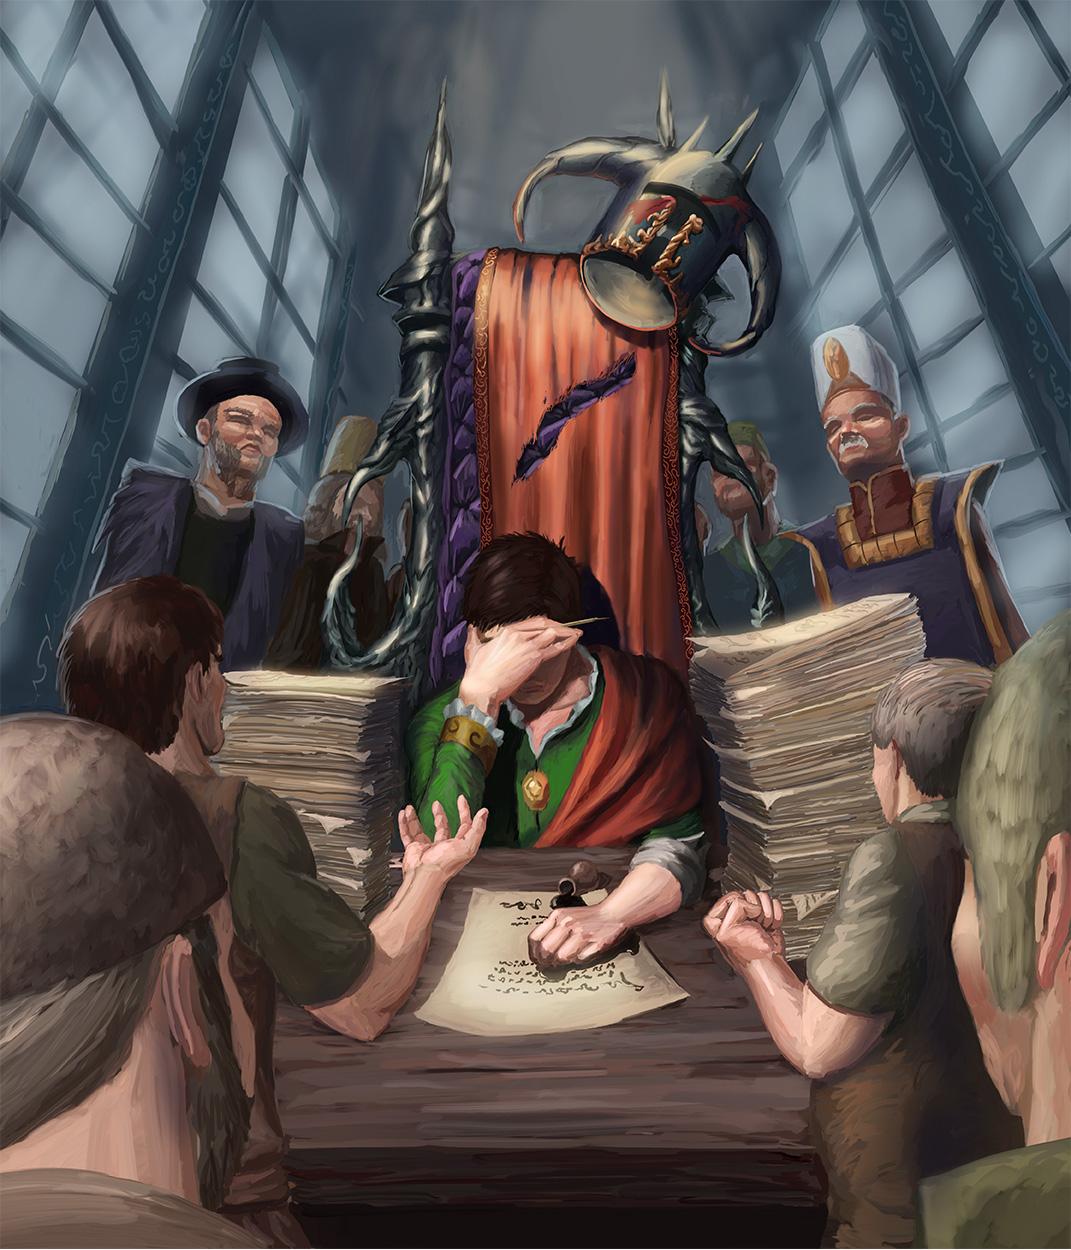 Illustration by Samuel Meas